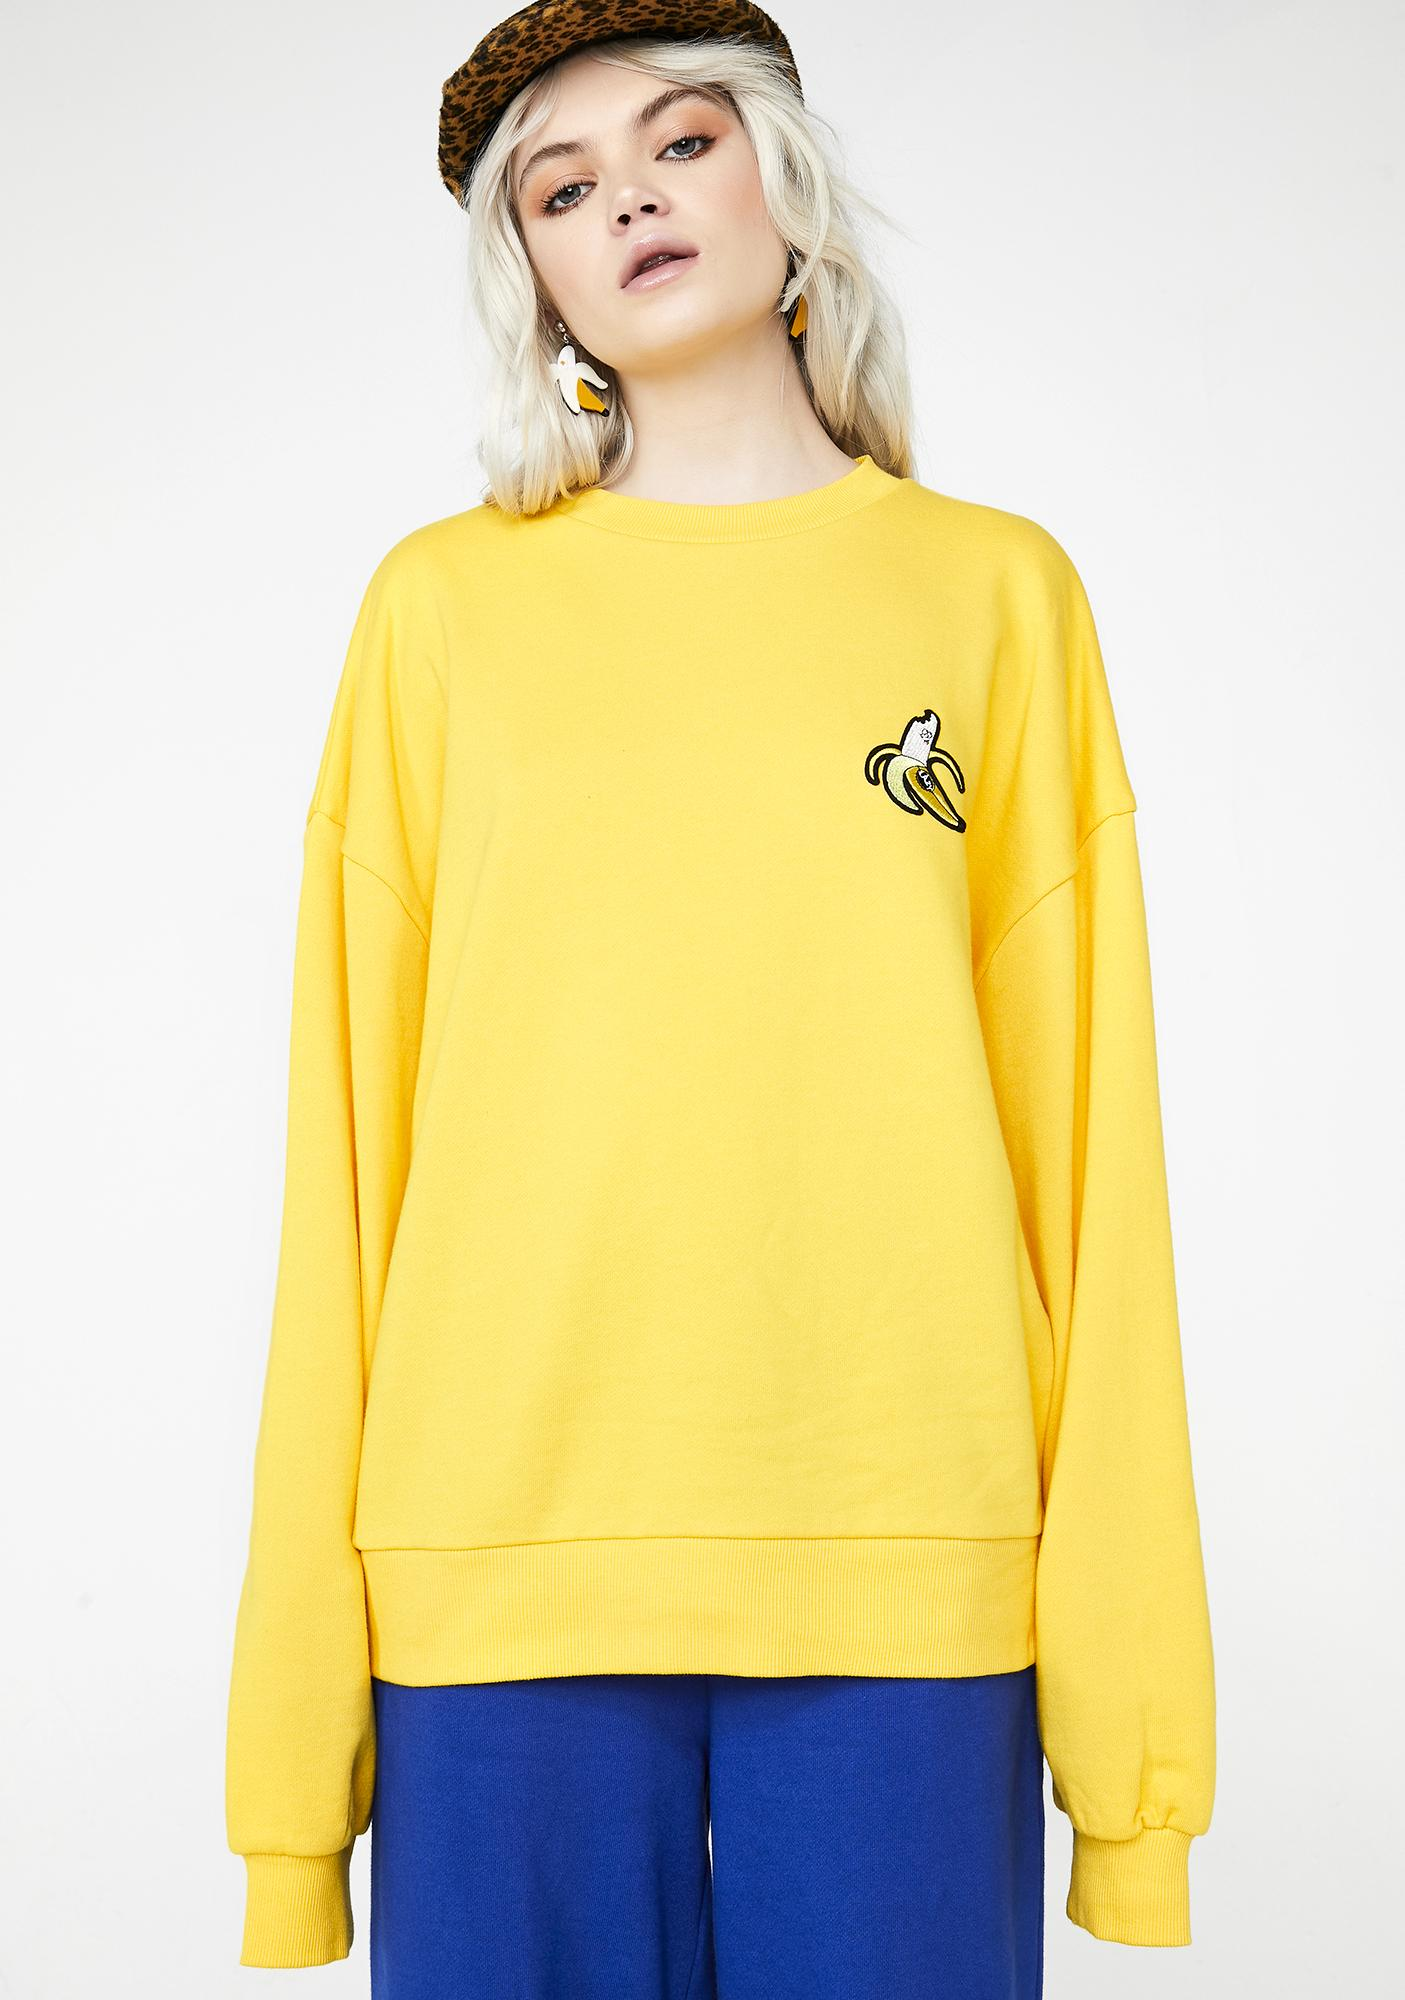 Lazy Oaf Banana Sweatshirt